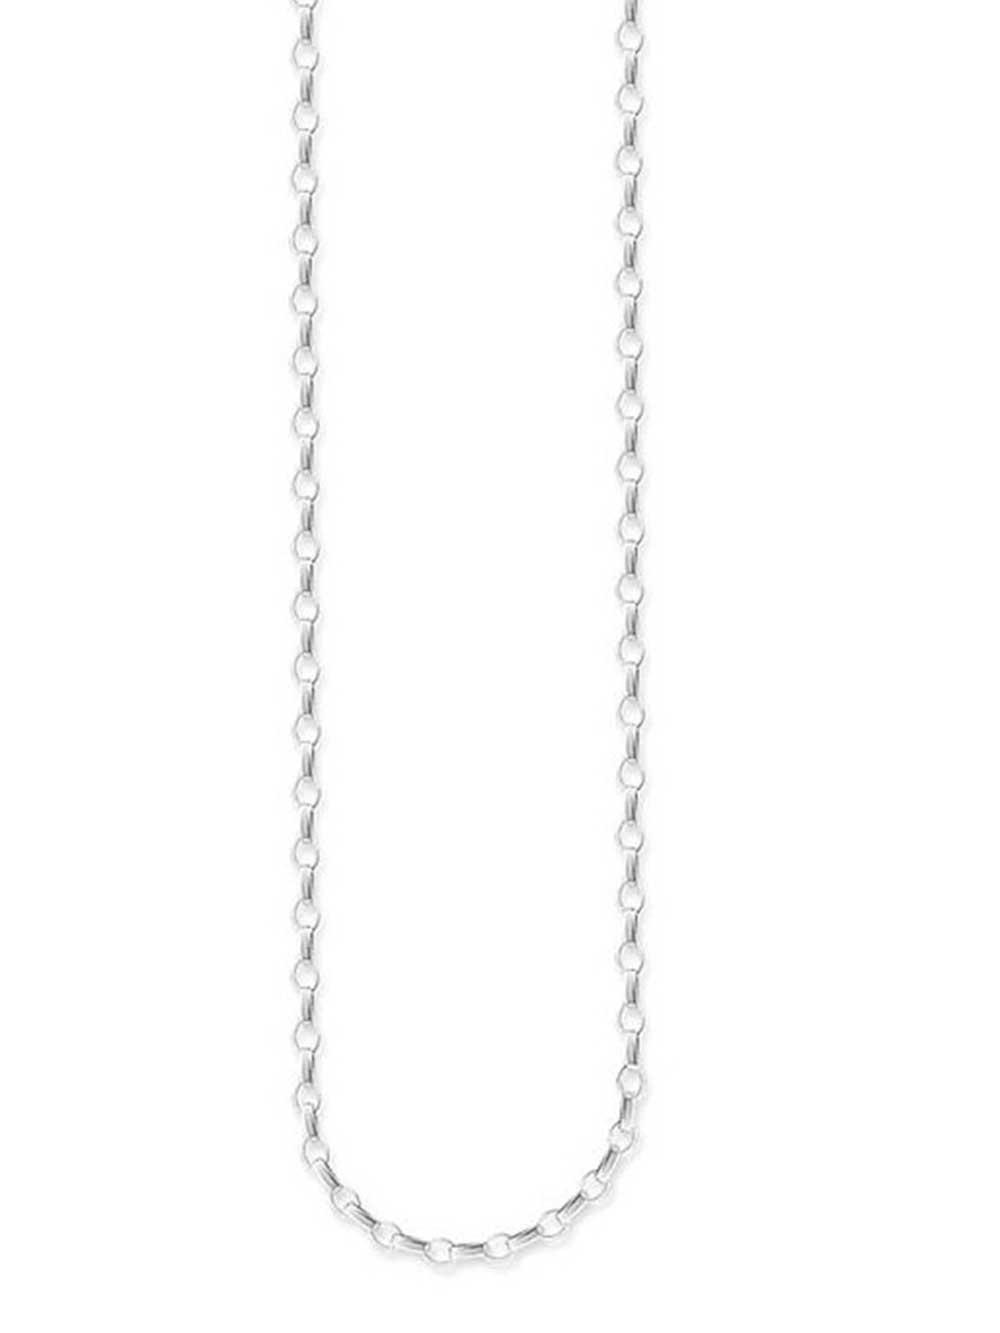 Thomas Sabo Halskette X0002-001-12 925er 70cm